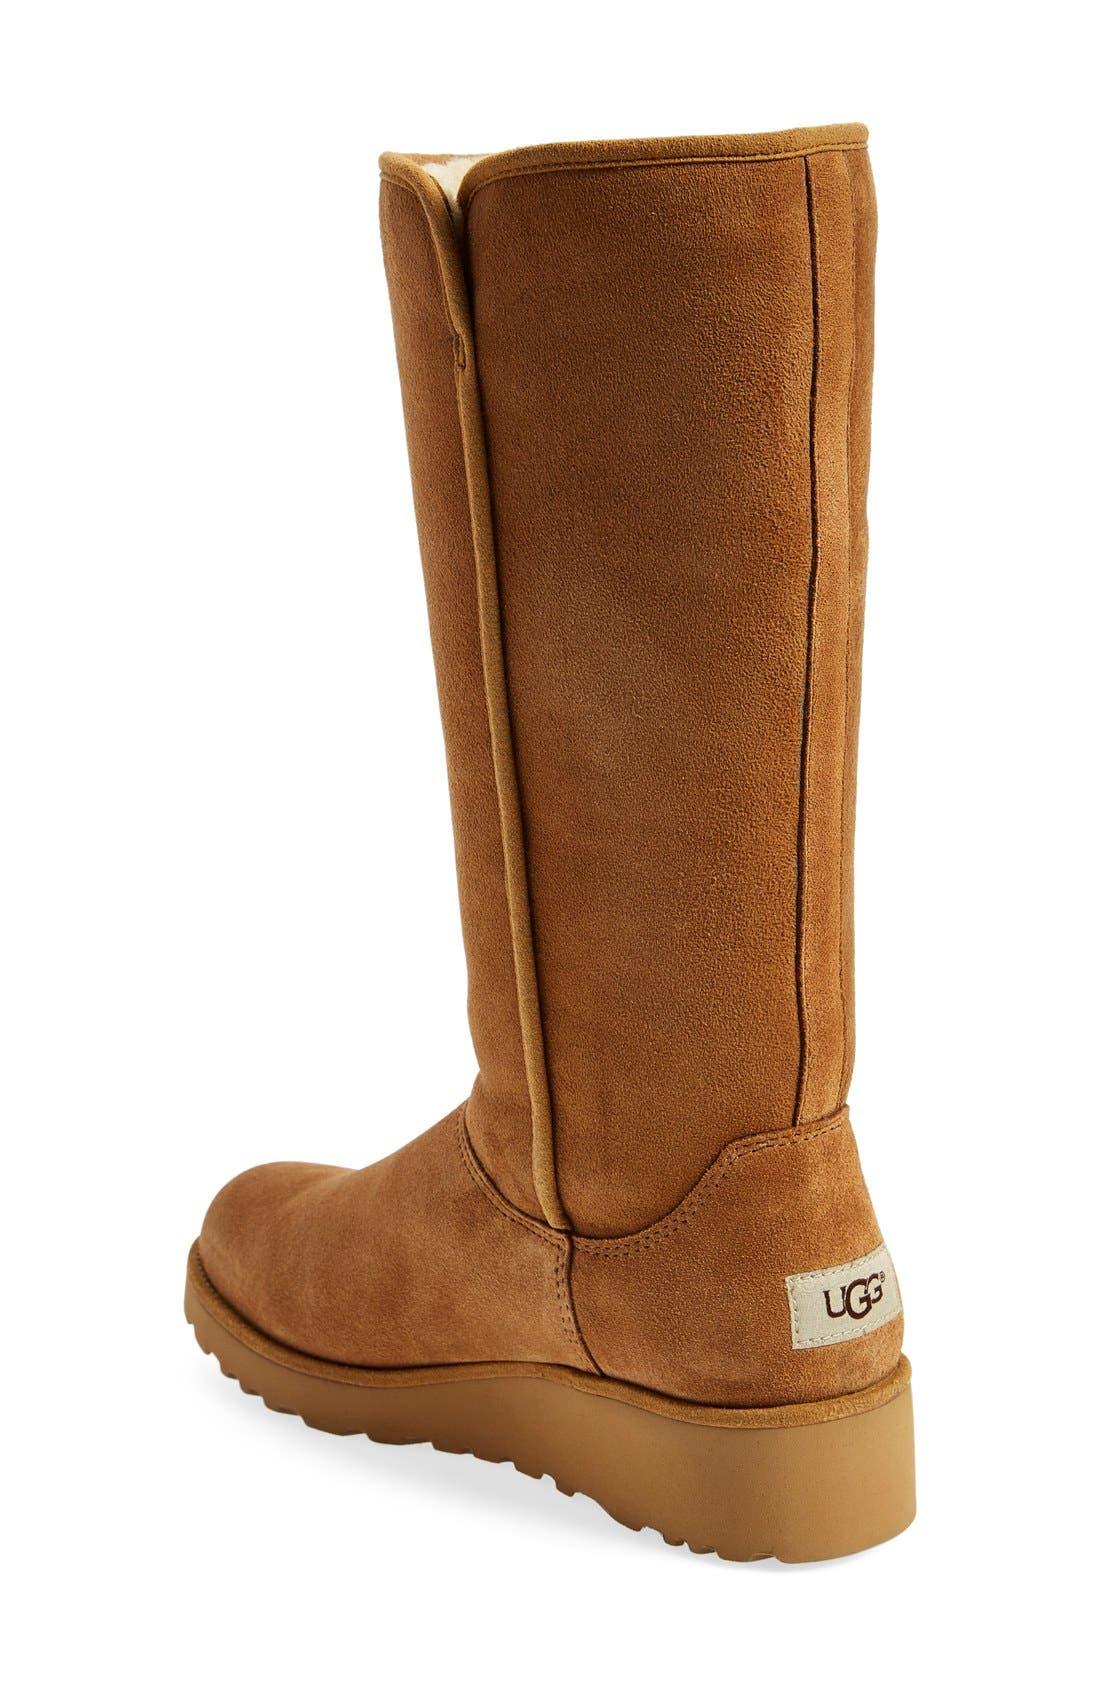 Alternate Image 2  - UGG® Kara - Classic Slim™ Water Resistant Tall Boot (Women)